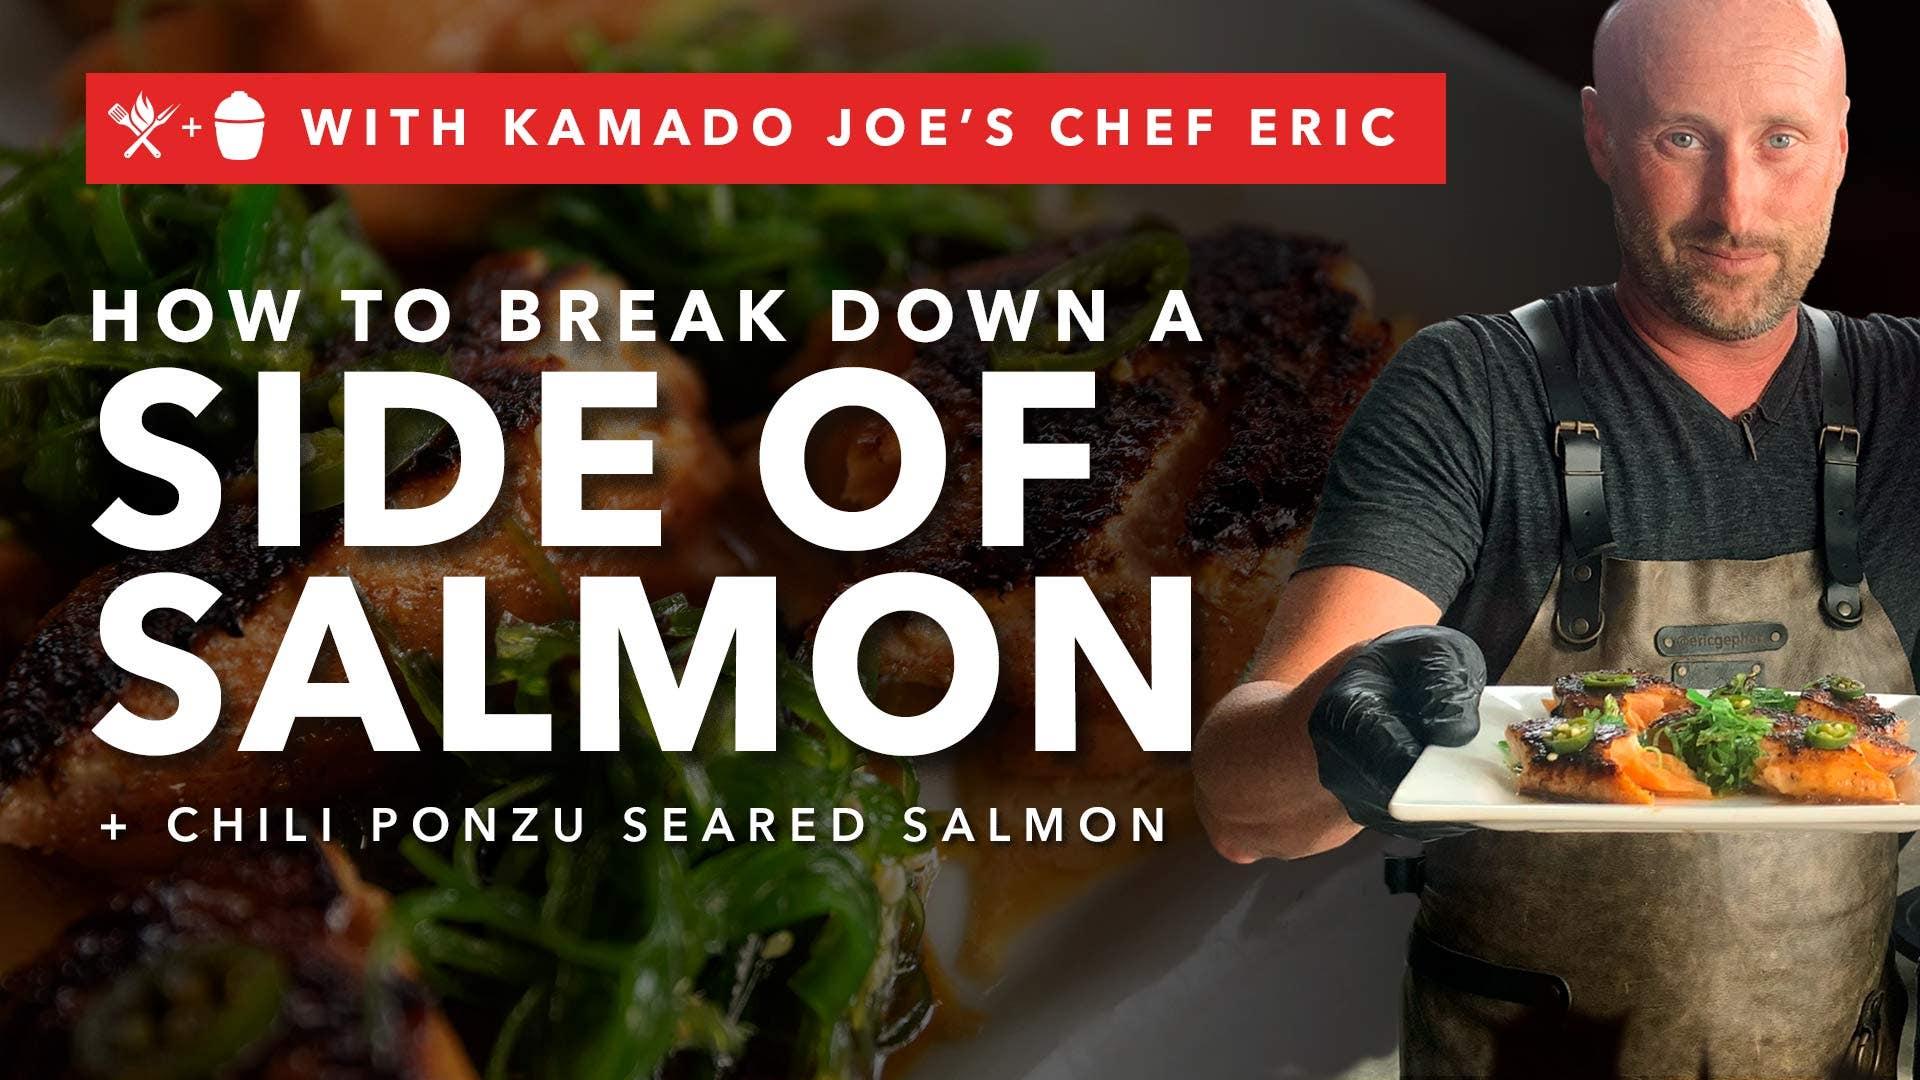 How to Break Down a Side of Salmon + Chili Ponzu Seared Salmon